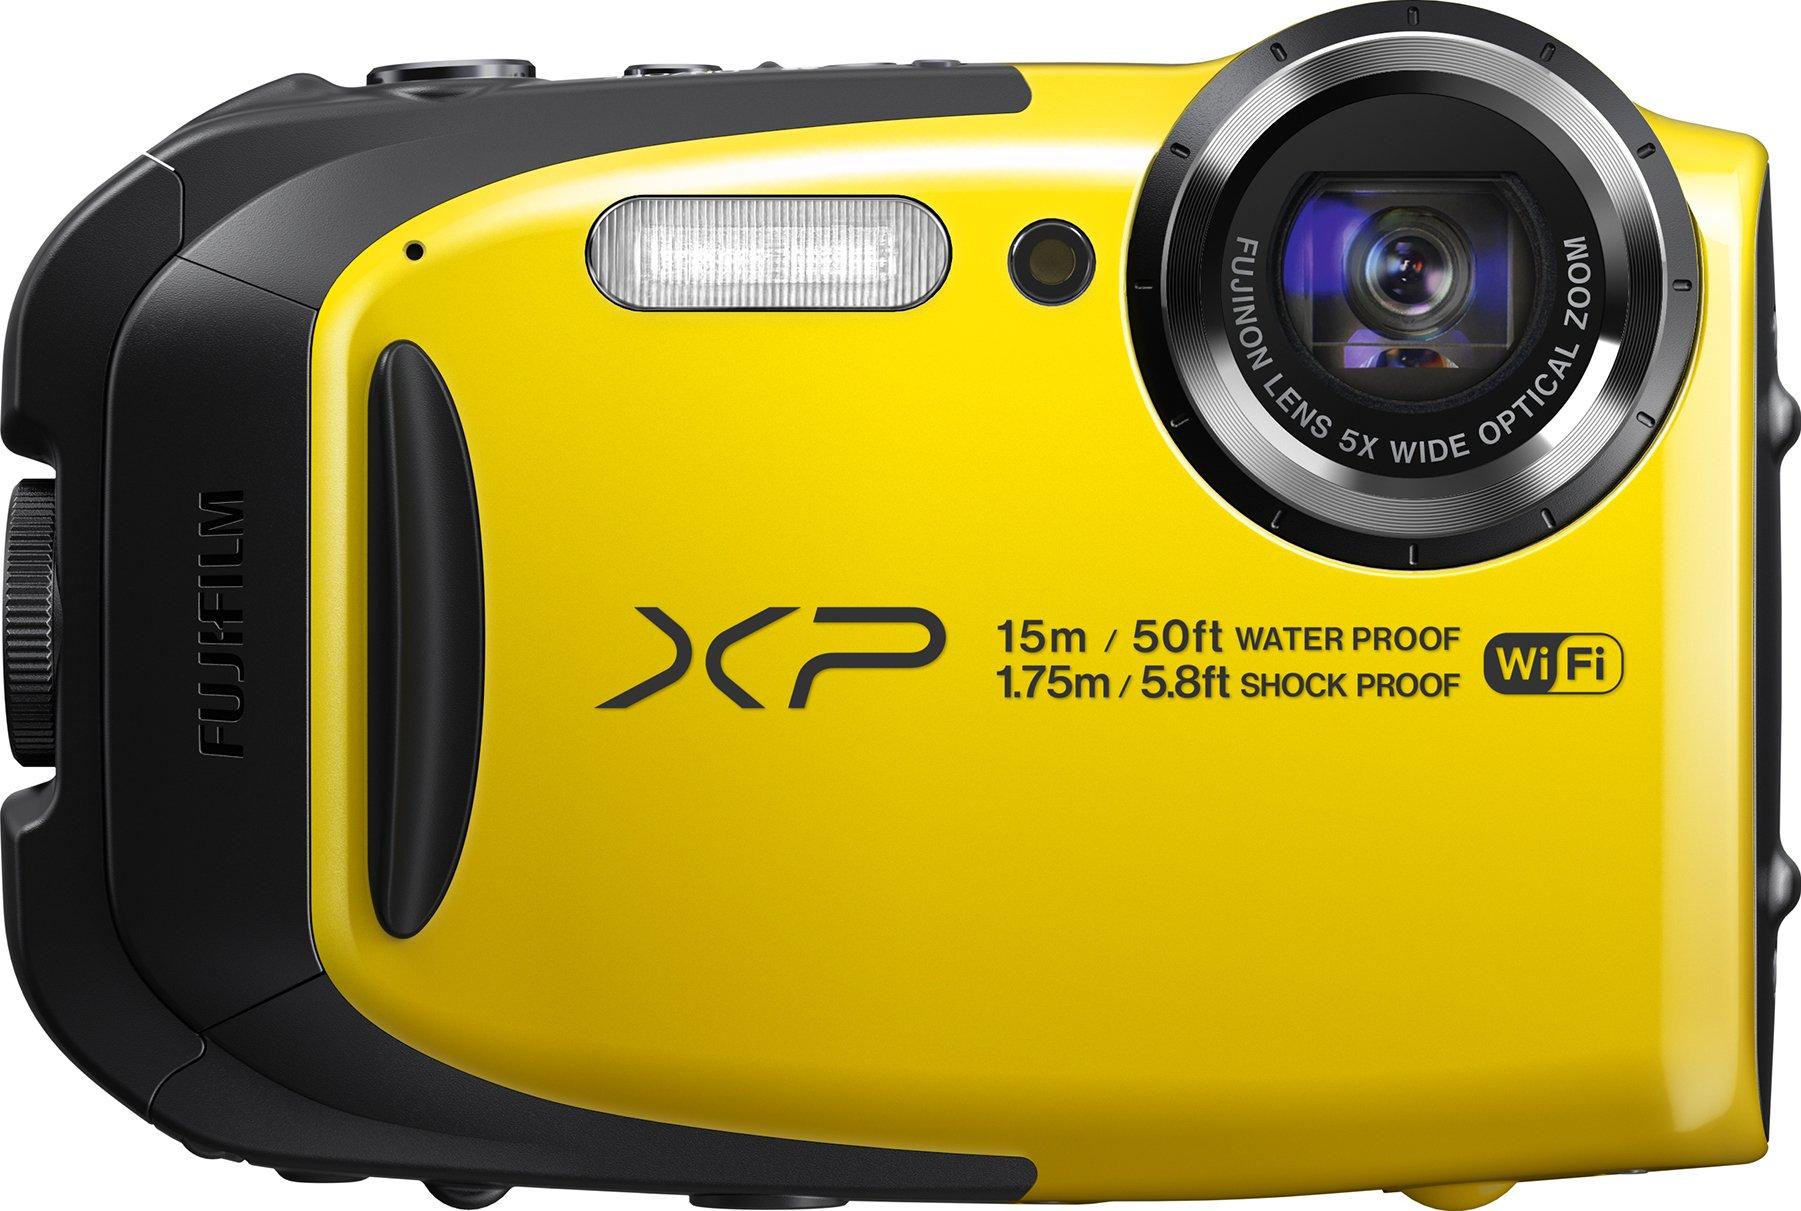 Fujifilm FinePix XP80 Waterproof Digital Camera with 2.7-Inch LCD (Yellow) by Fujifilm